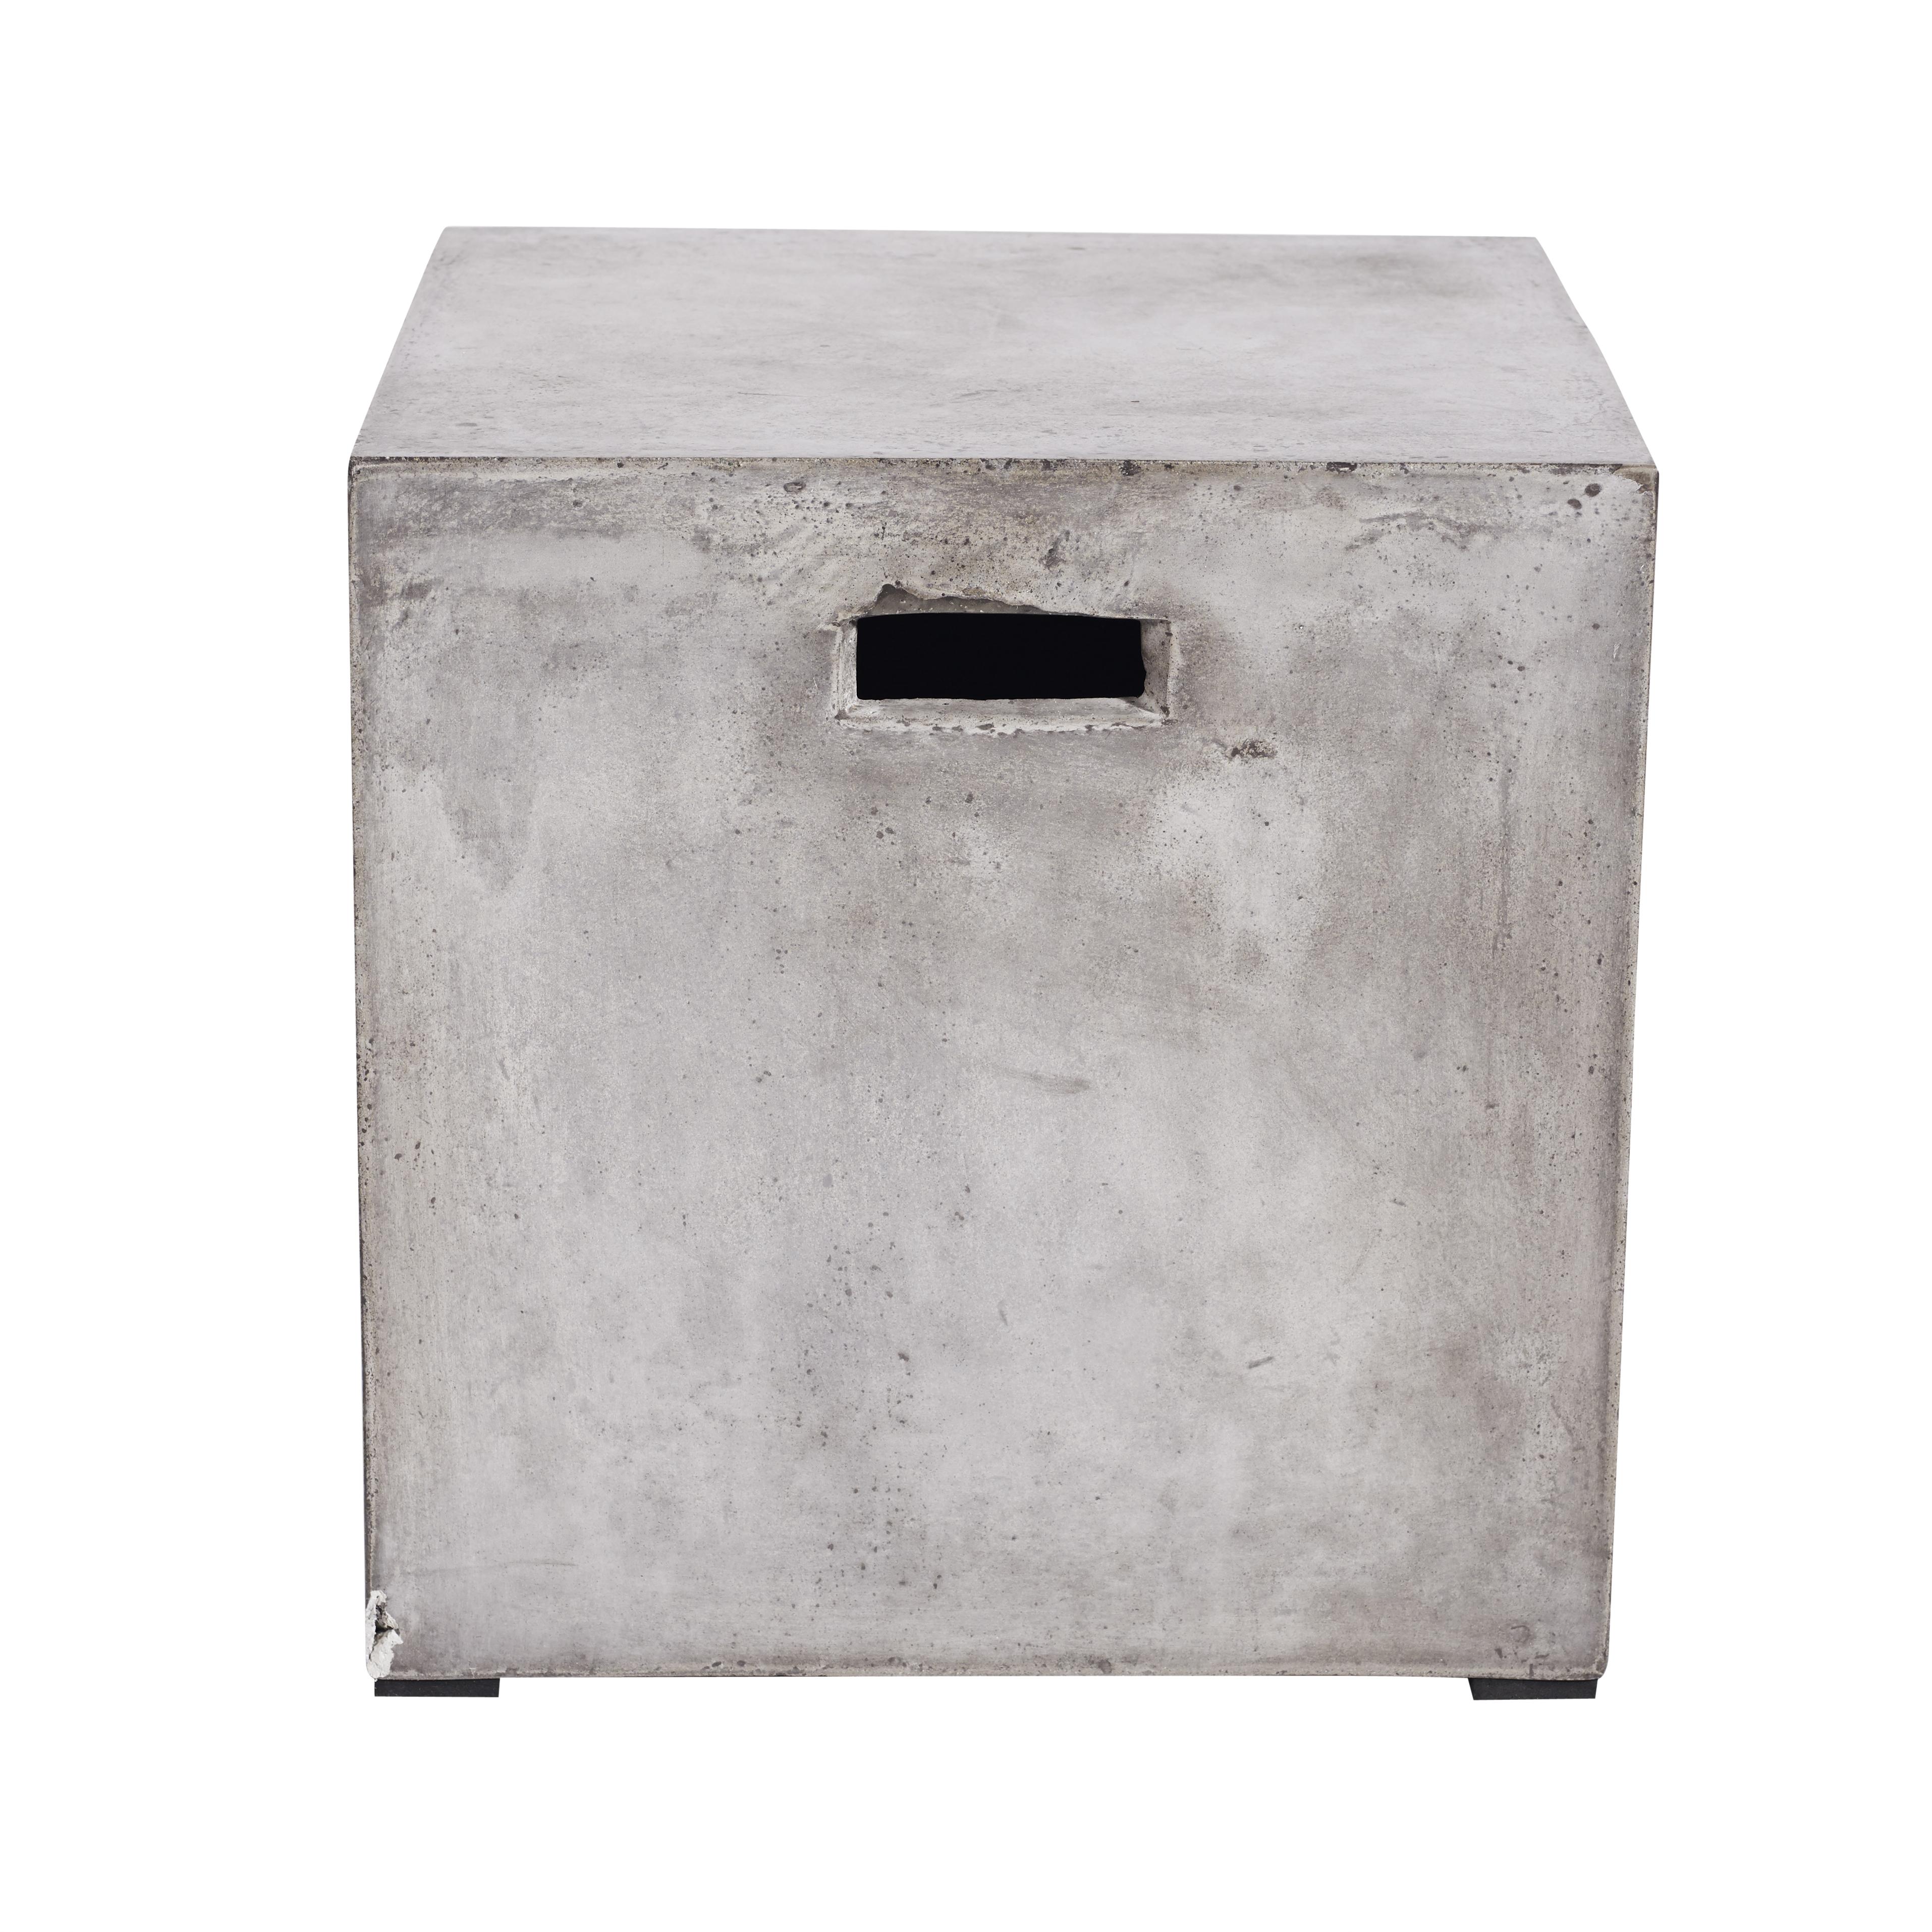 MUUBS, Nixxin - Taburet / Lille bord i beton